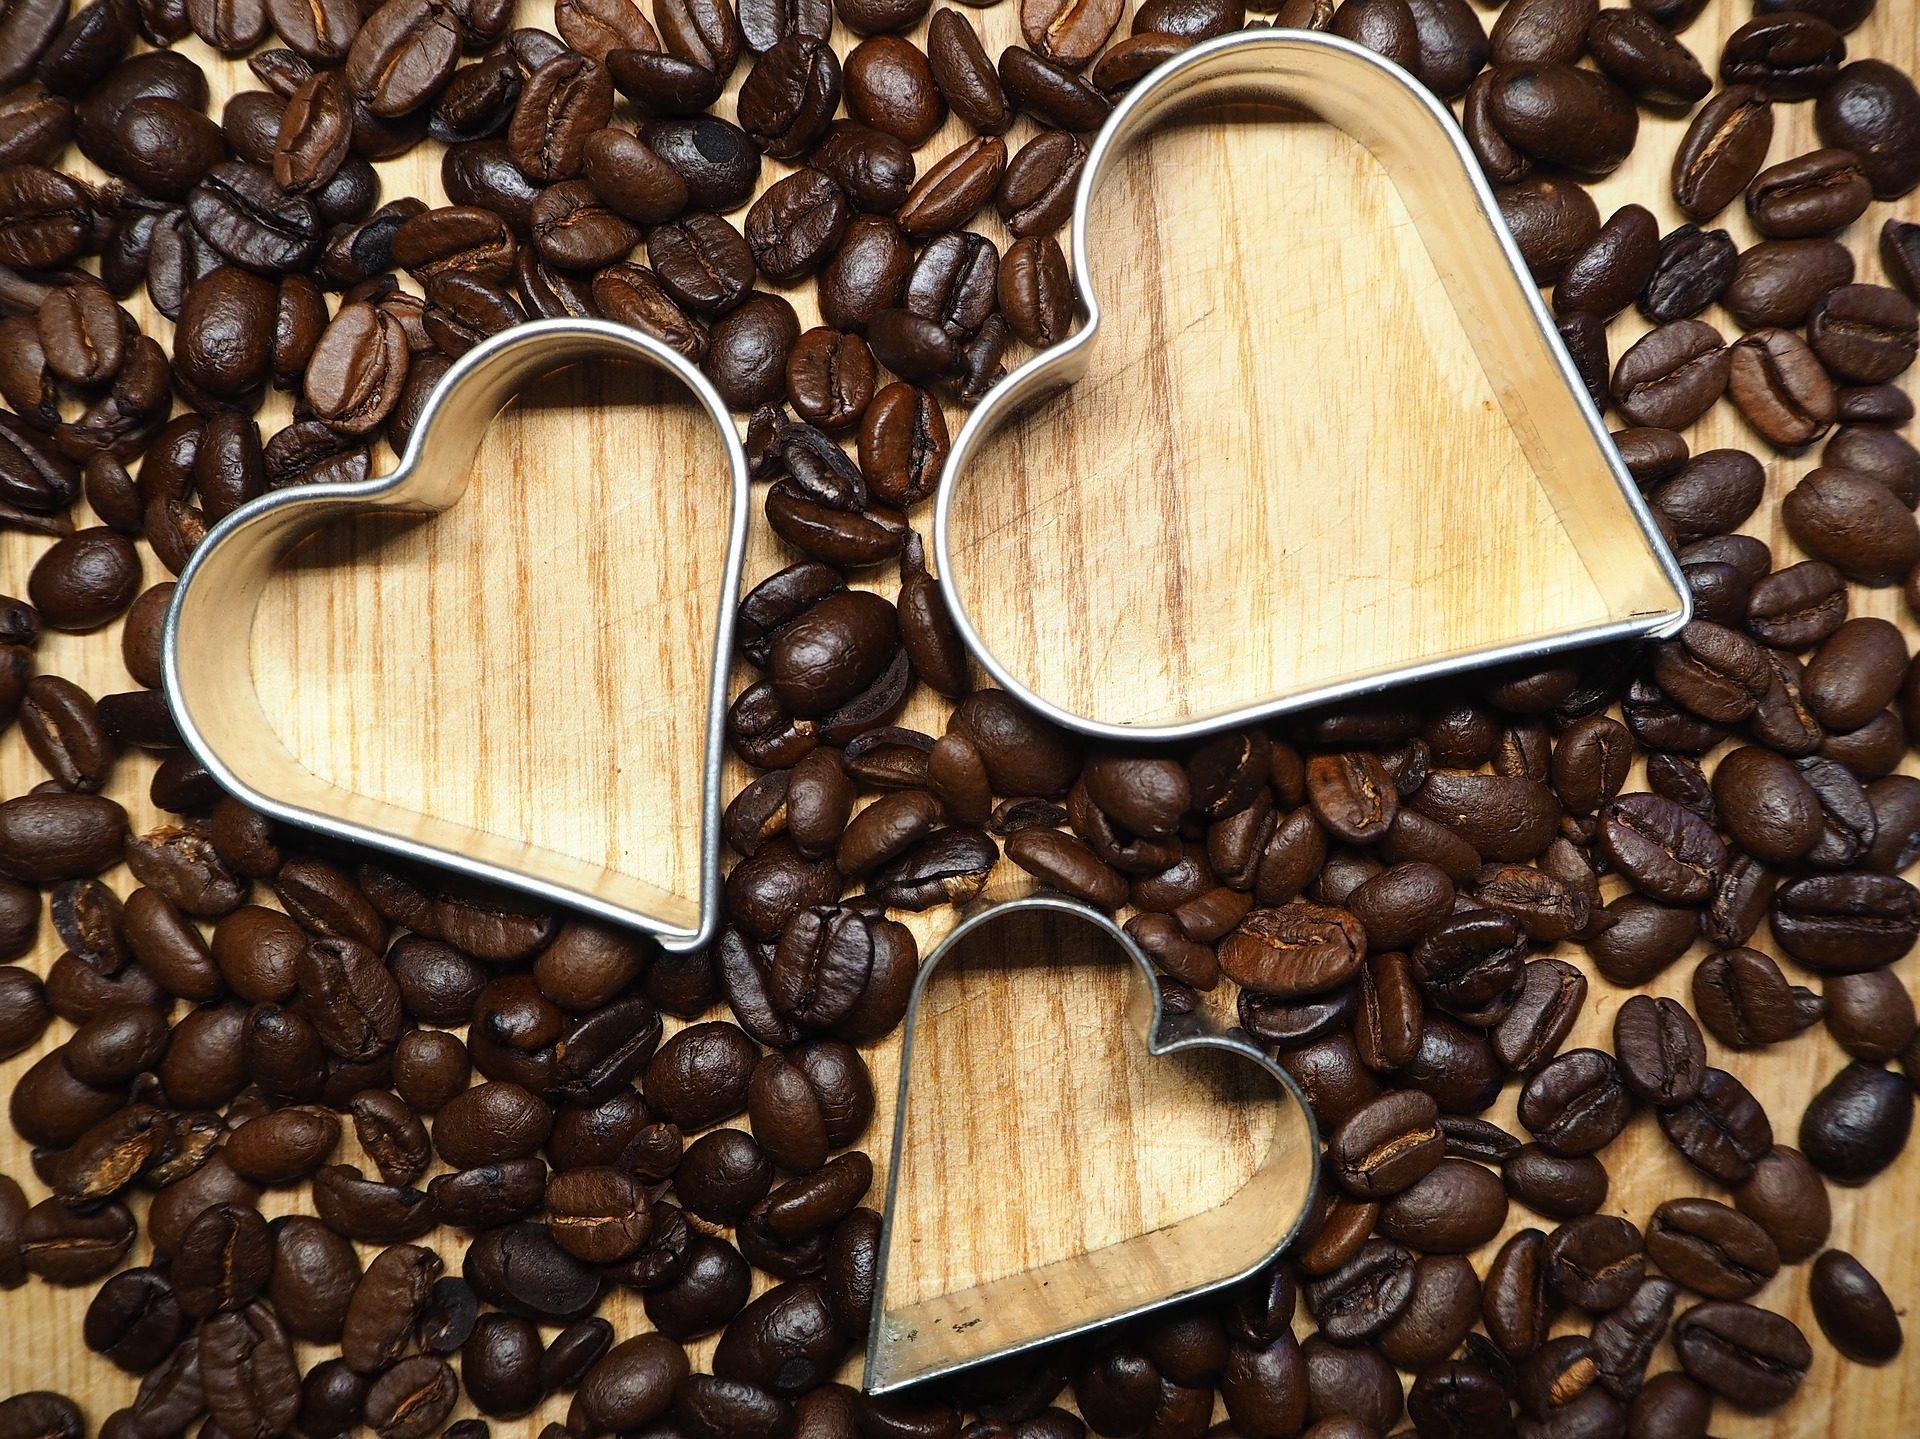 Molds, दिल, अनाज, कॉफी, लकड़ी - HD वॉलपेपर - प्रोफेसर-falken.com